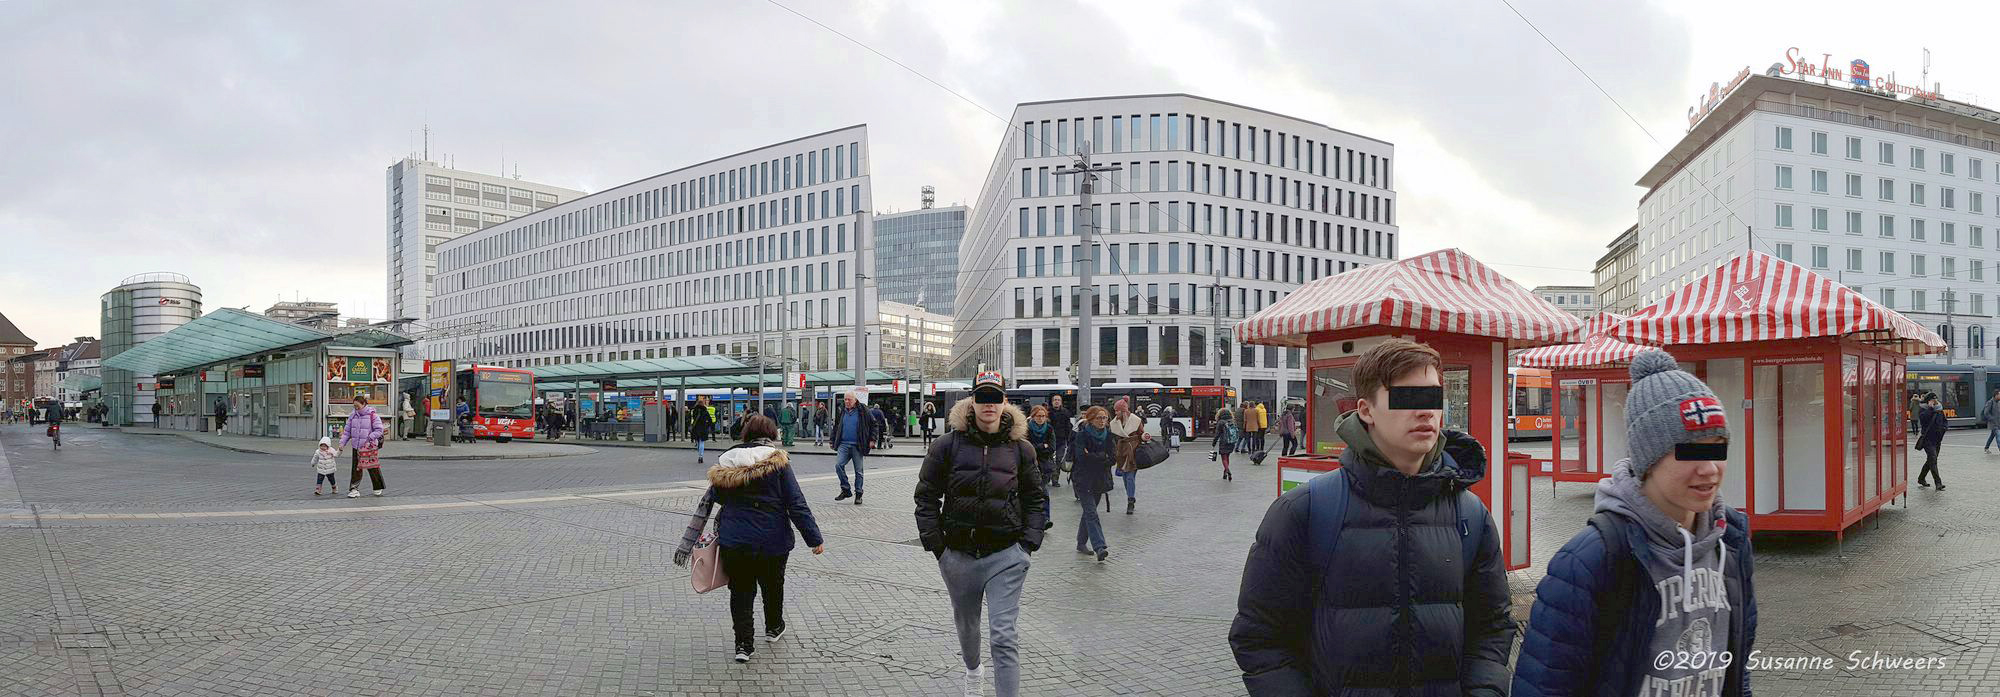 Baustelle Bahnhofsplatz 345